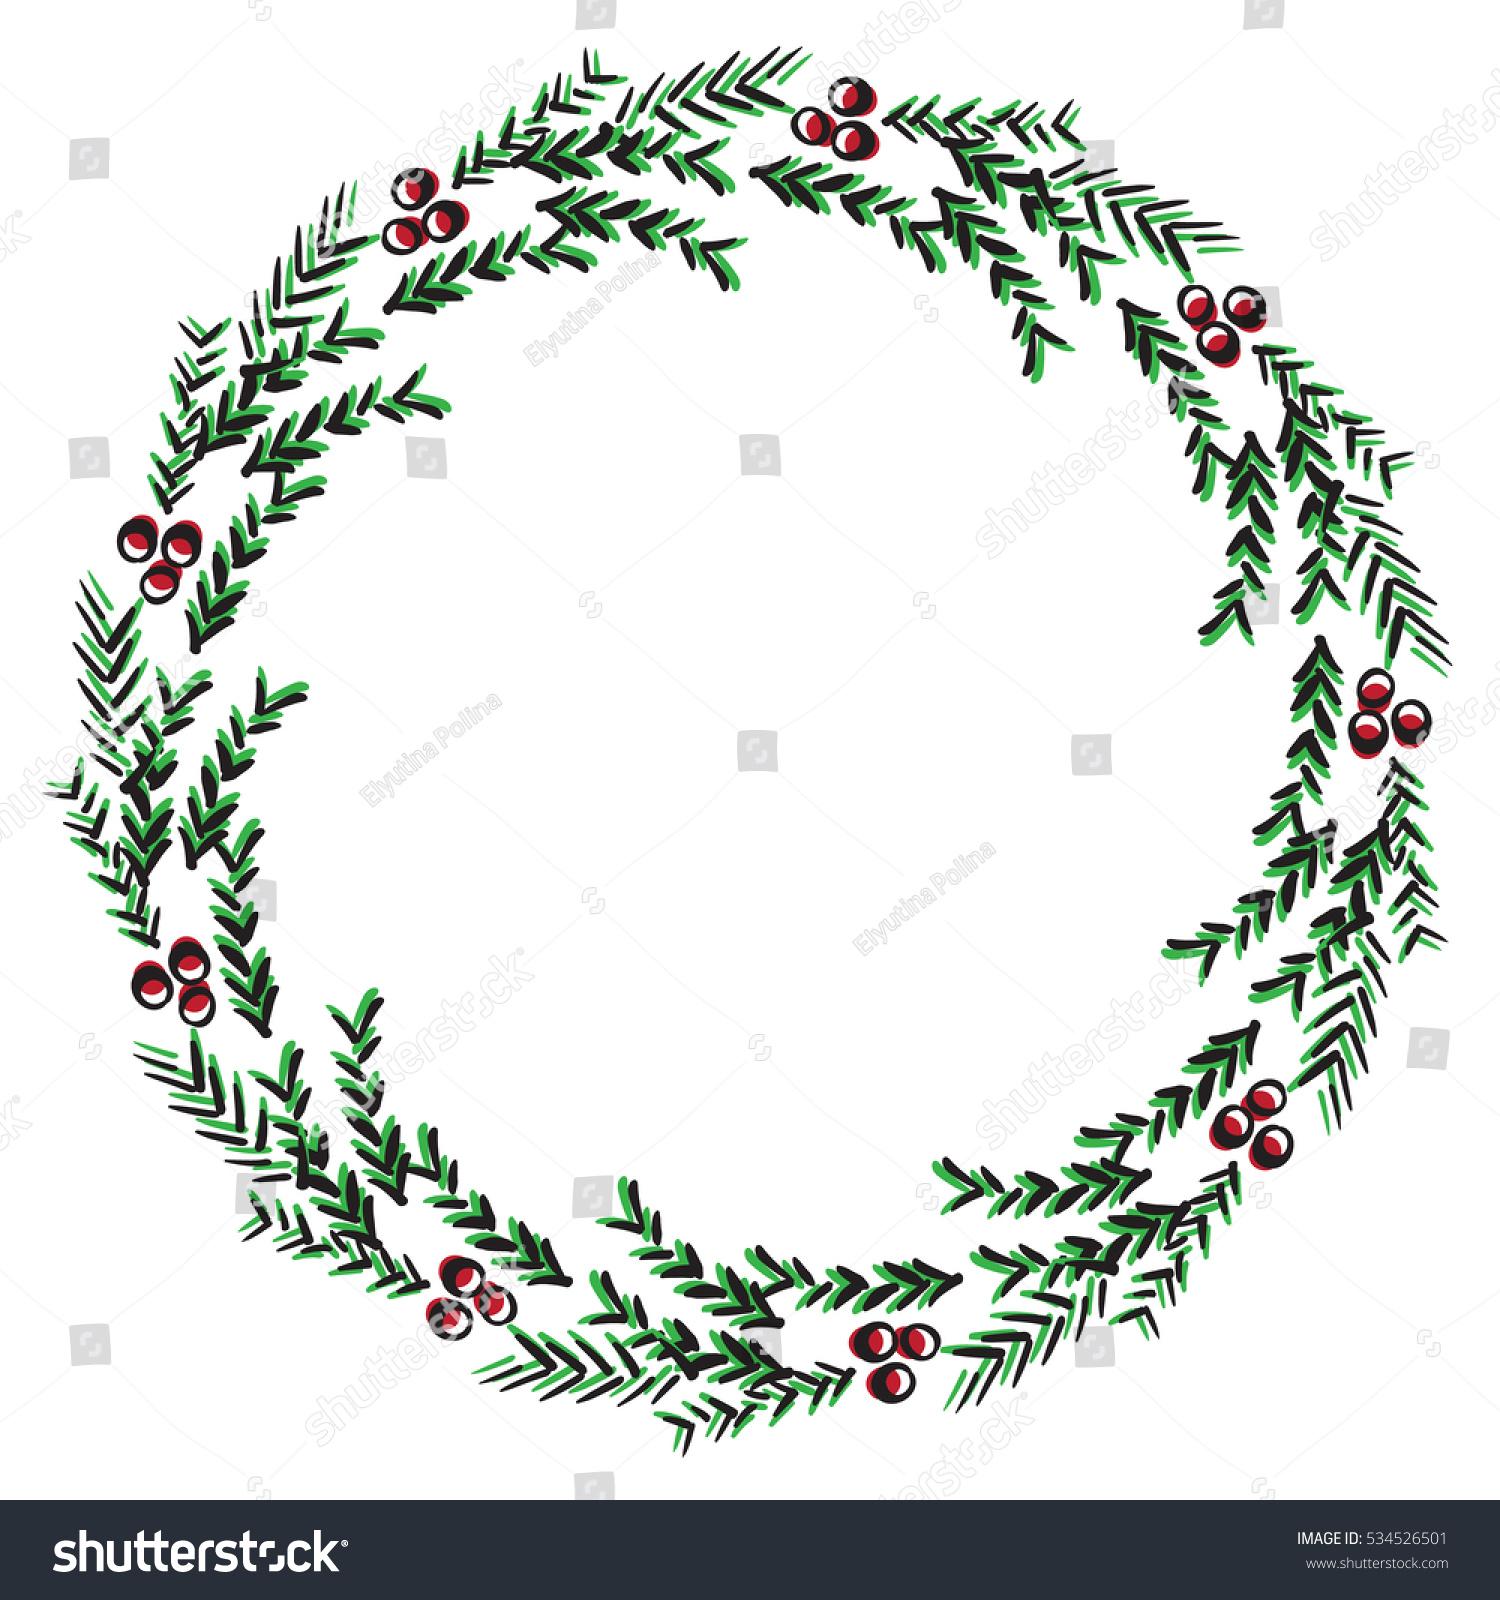 Vector Illustration Sketch Greeting Christmas Tree Stock Vector ...